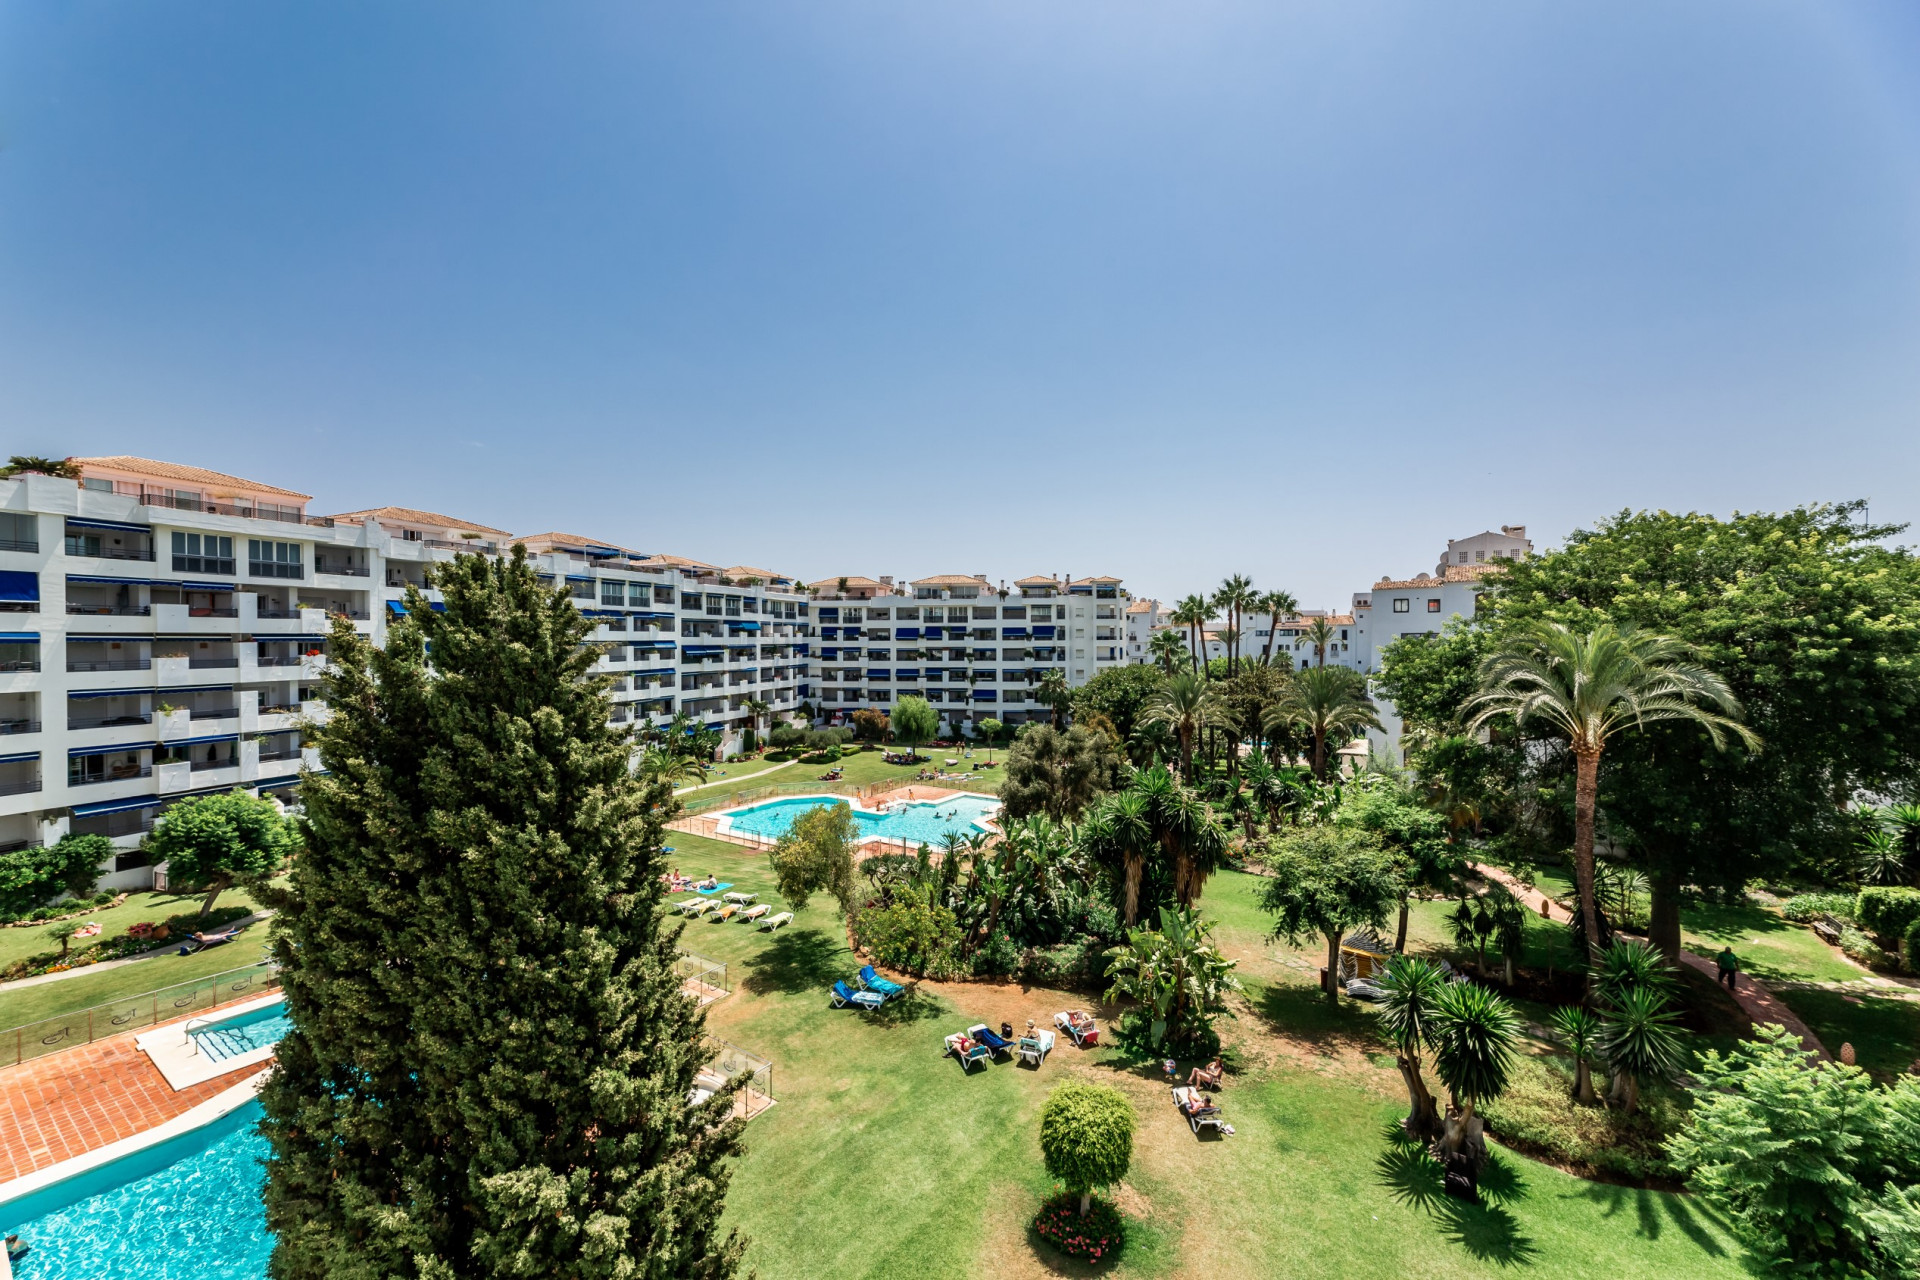 ARFA1440-1 Traumhafte 3 Schlafzimmer Wohnung in Jardines del Puerto in Puerto Banus ? Marbella